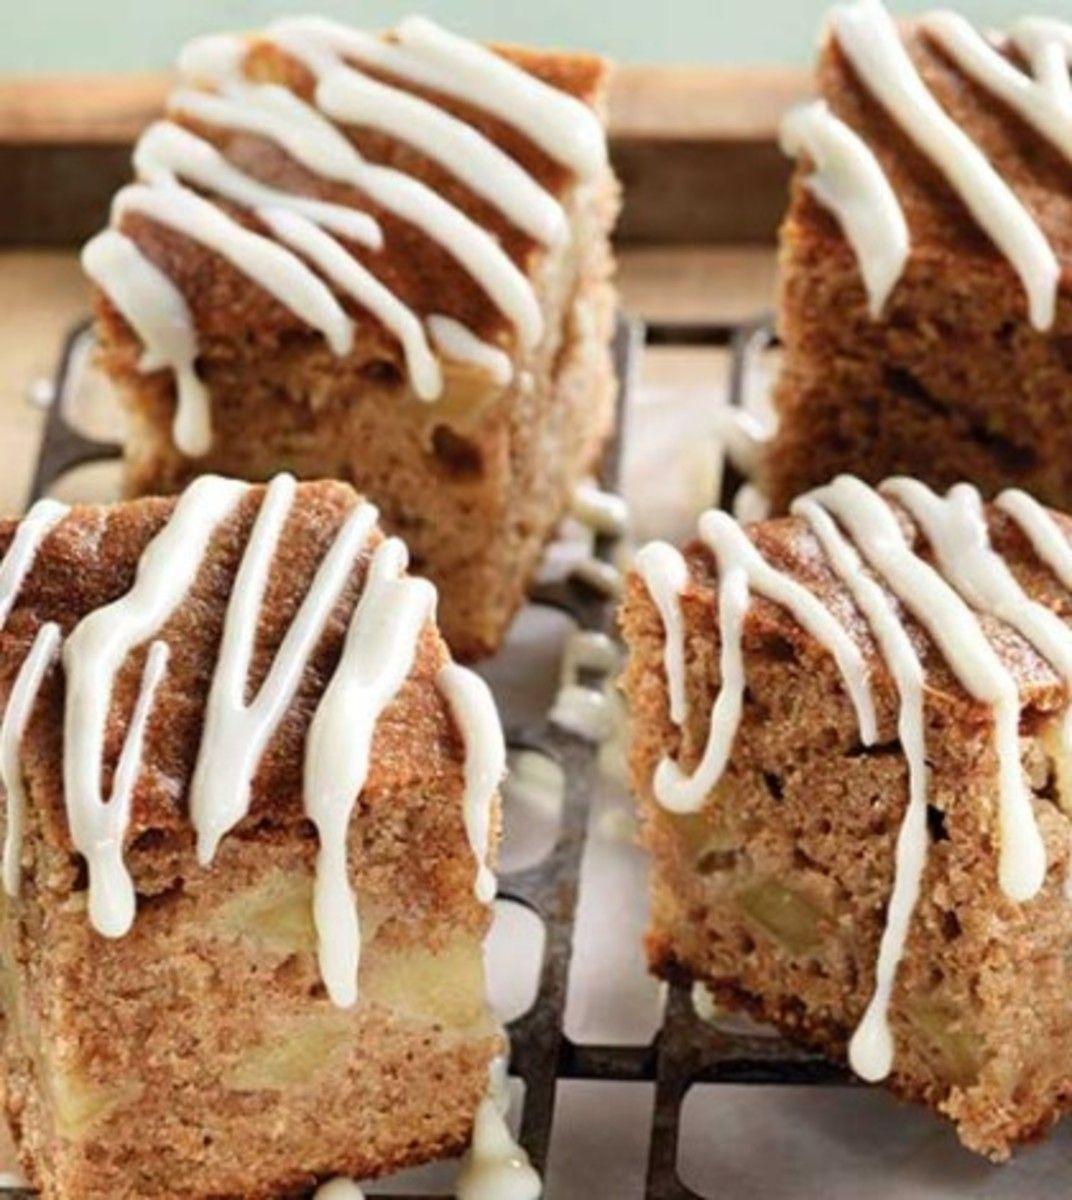 Apple Cinnamon Coffee Cake with Cream Cheese Glaze